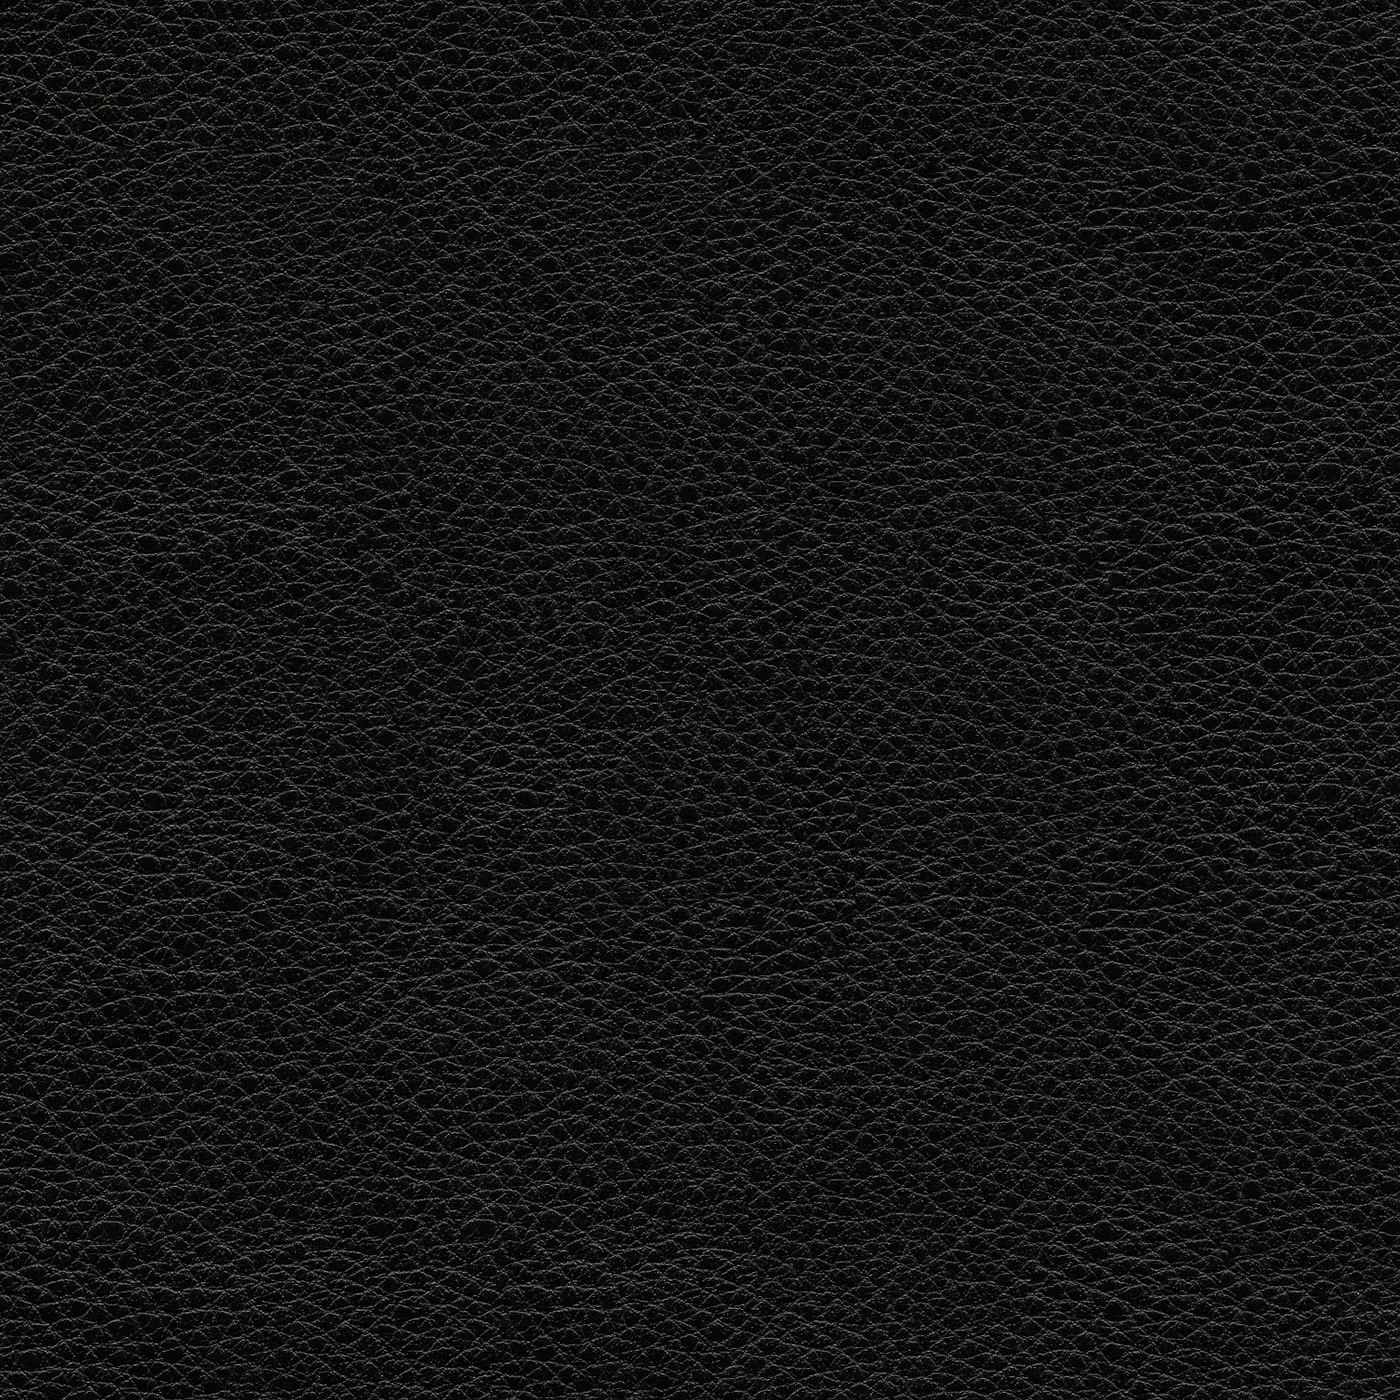 Baxter Chair Black Wallpaper Plain Black Wallpaper Leather Texture